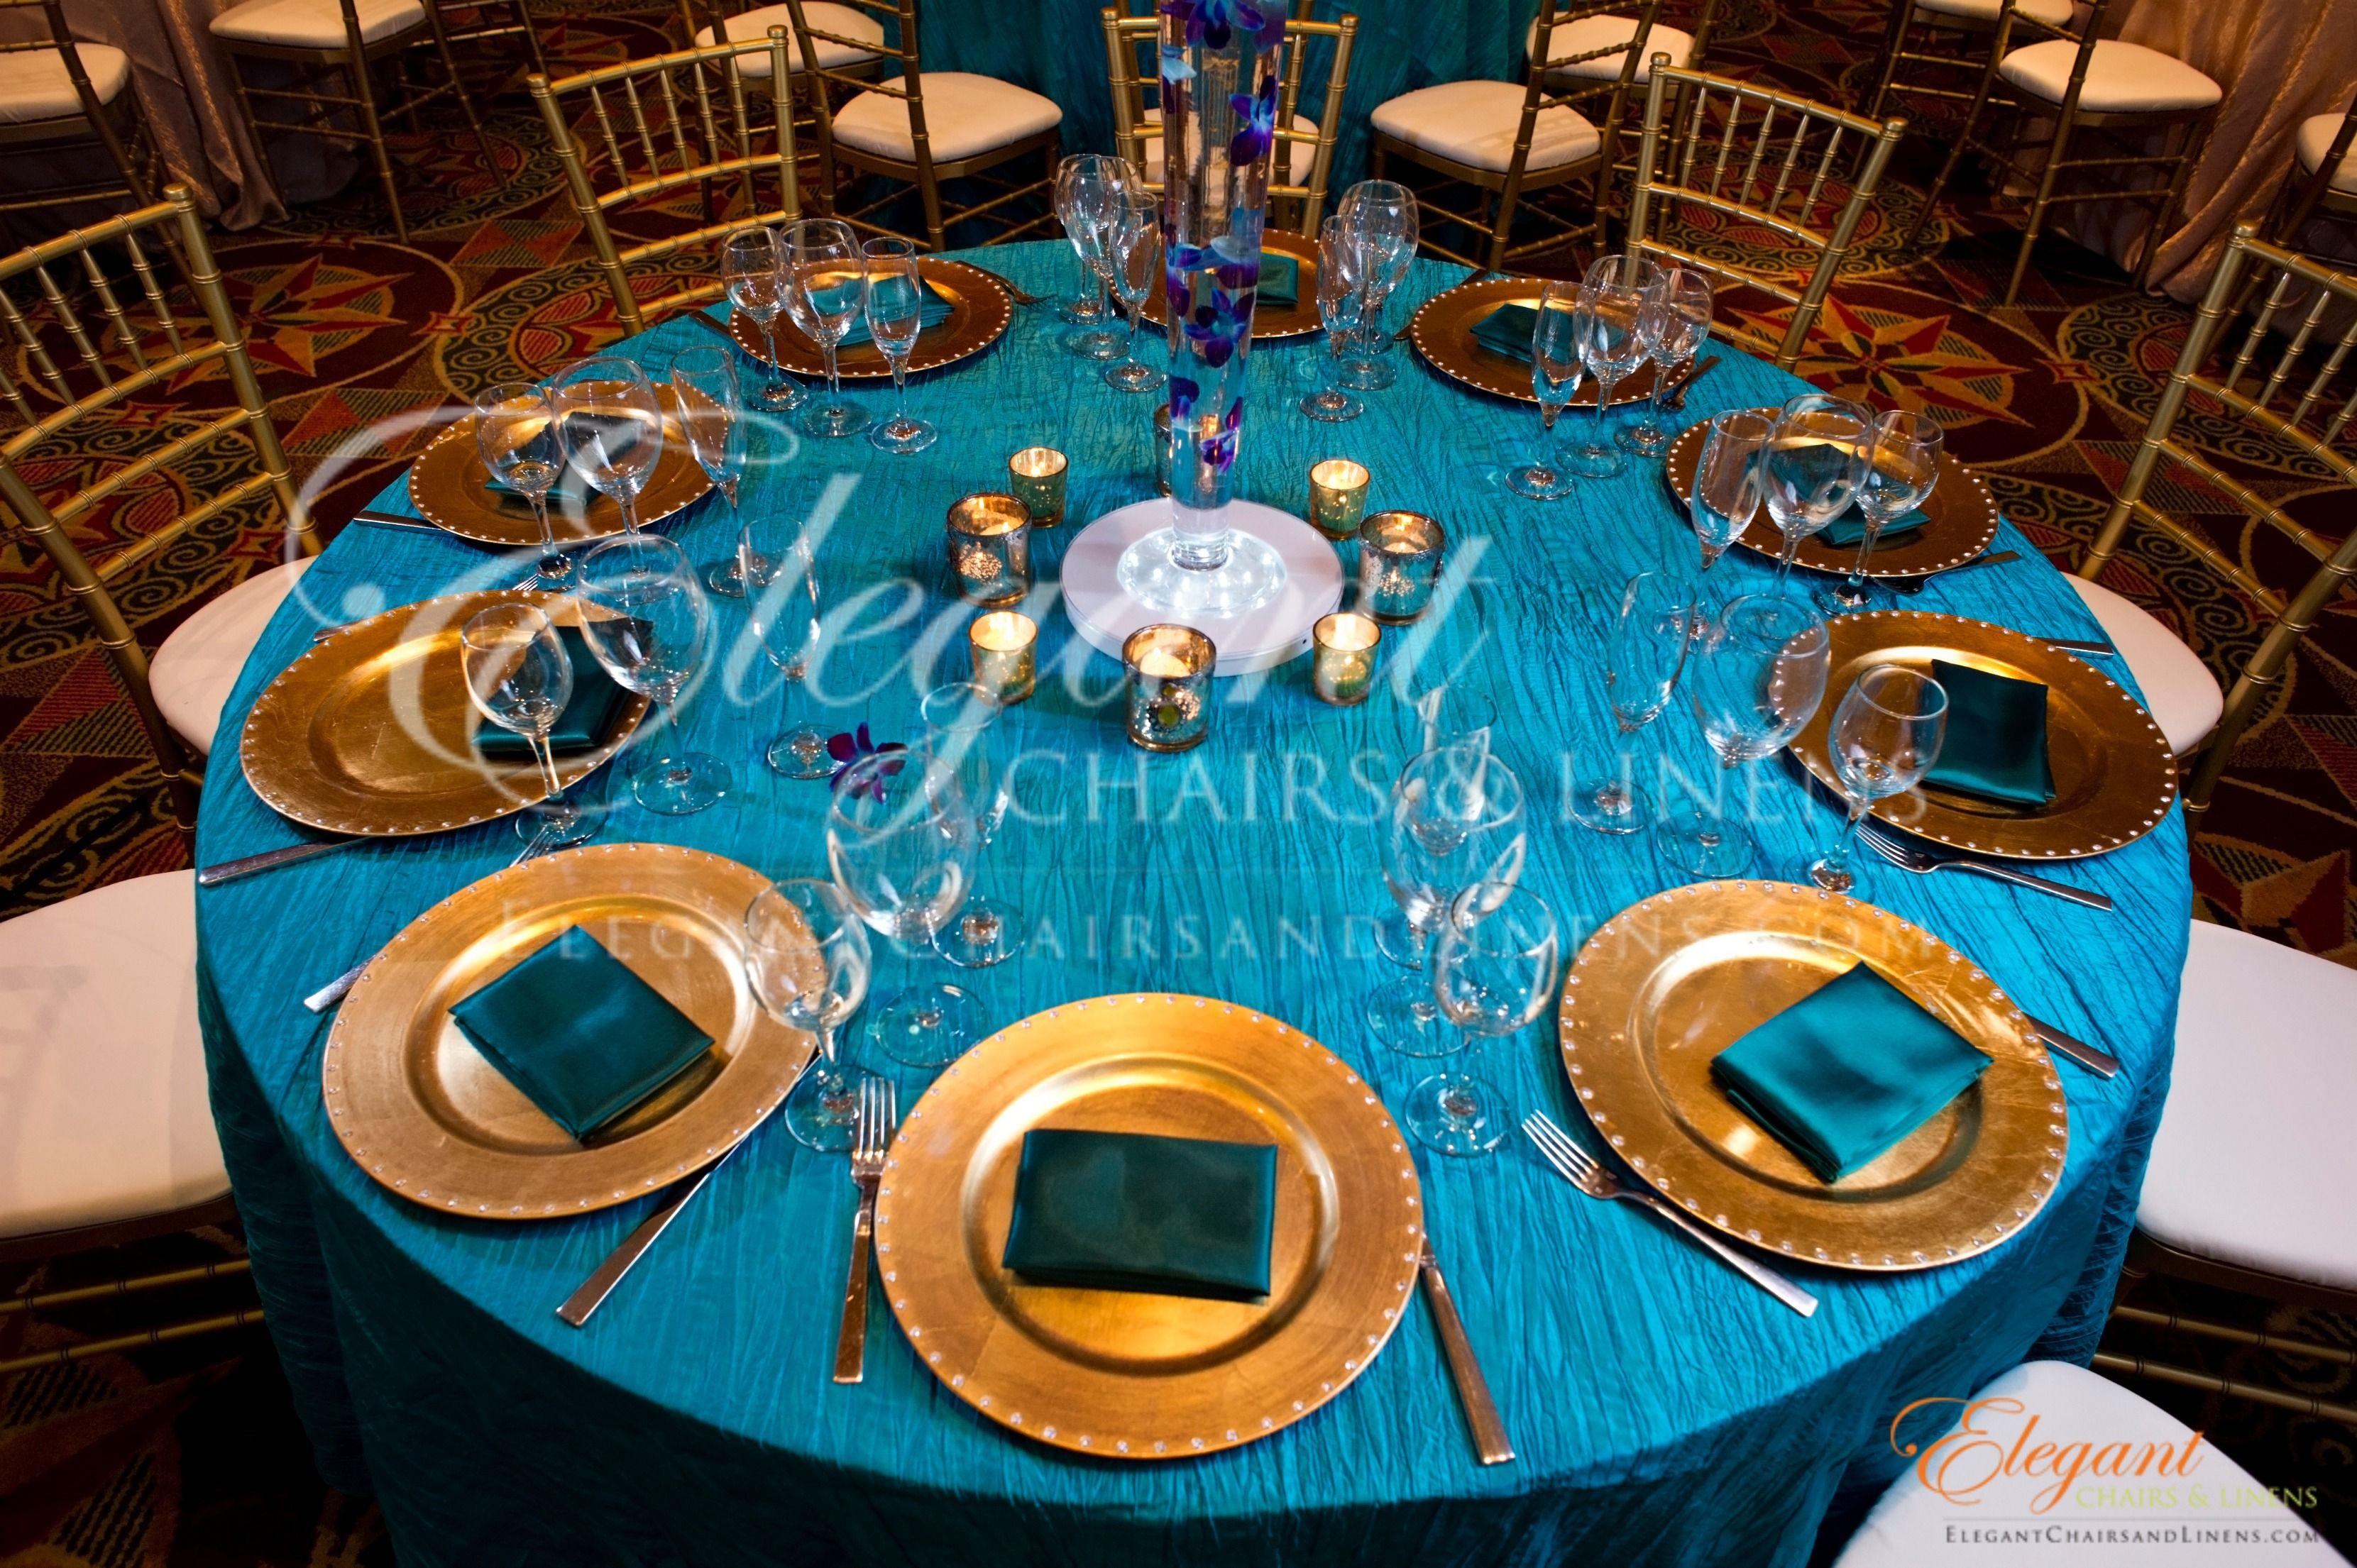 Wedding And Event Linens In Atlanta Ga Linens And Chiavari Chair Rental Atlanta Ga Www Elegantchairsandlinens Com Elegant Chair Event Table